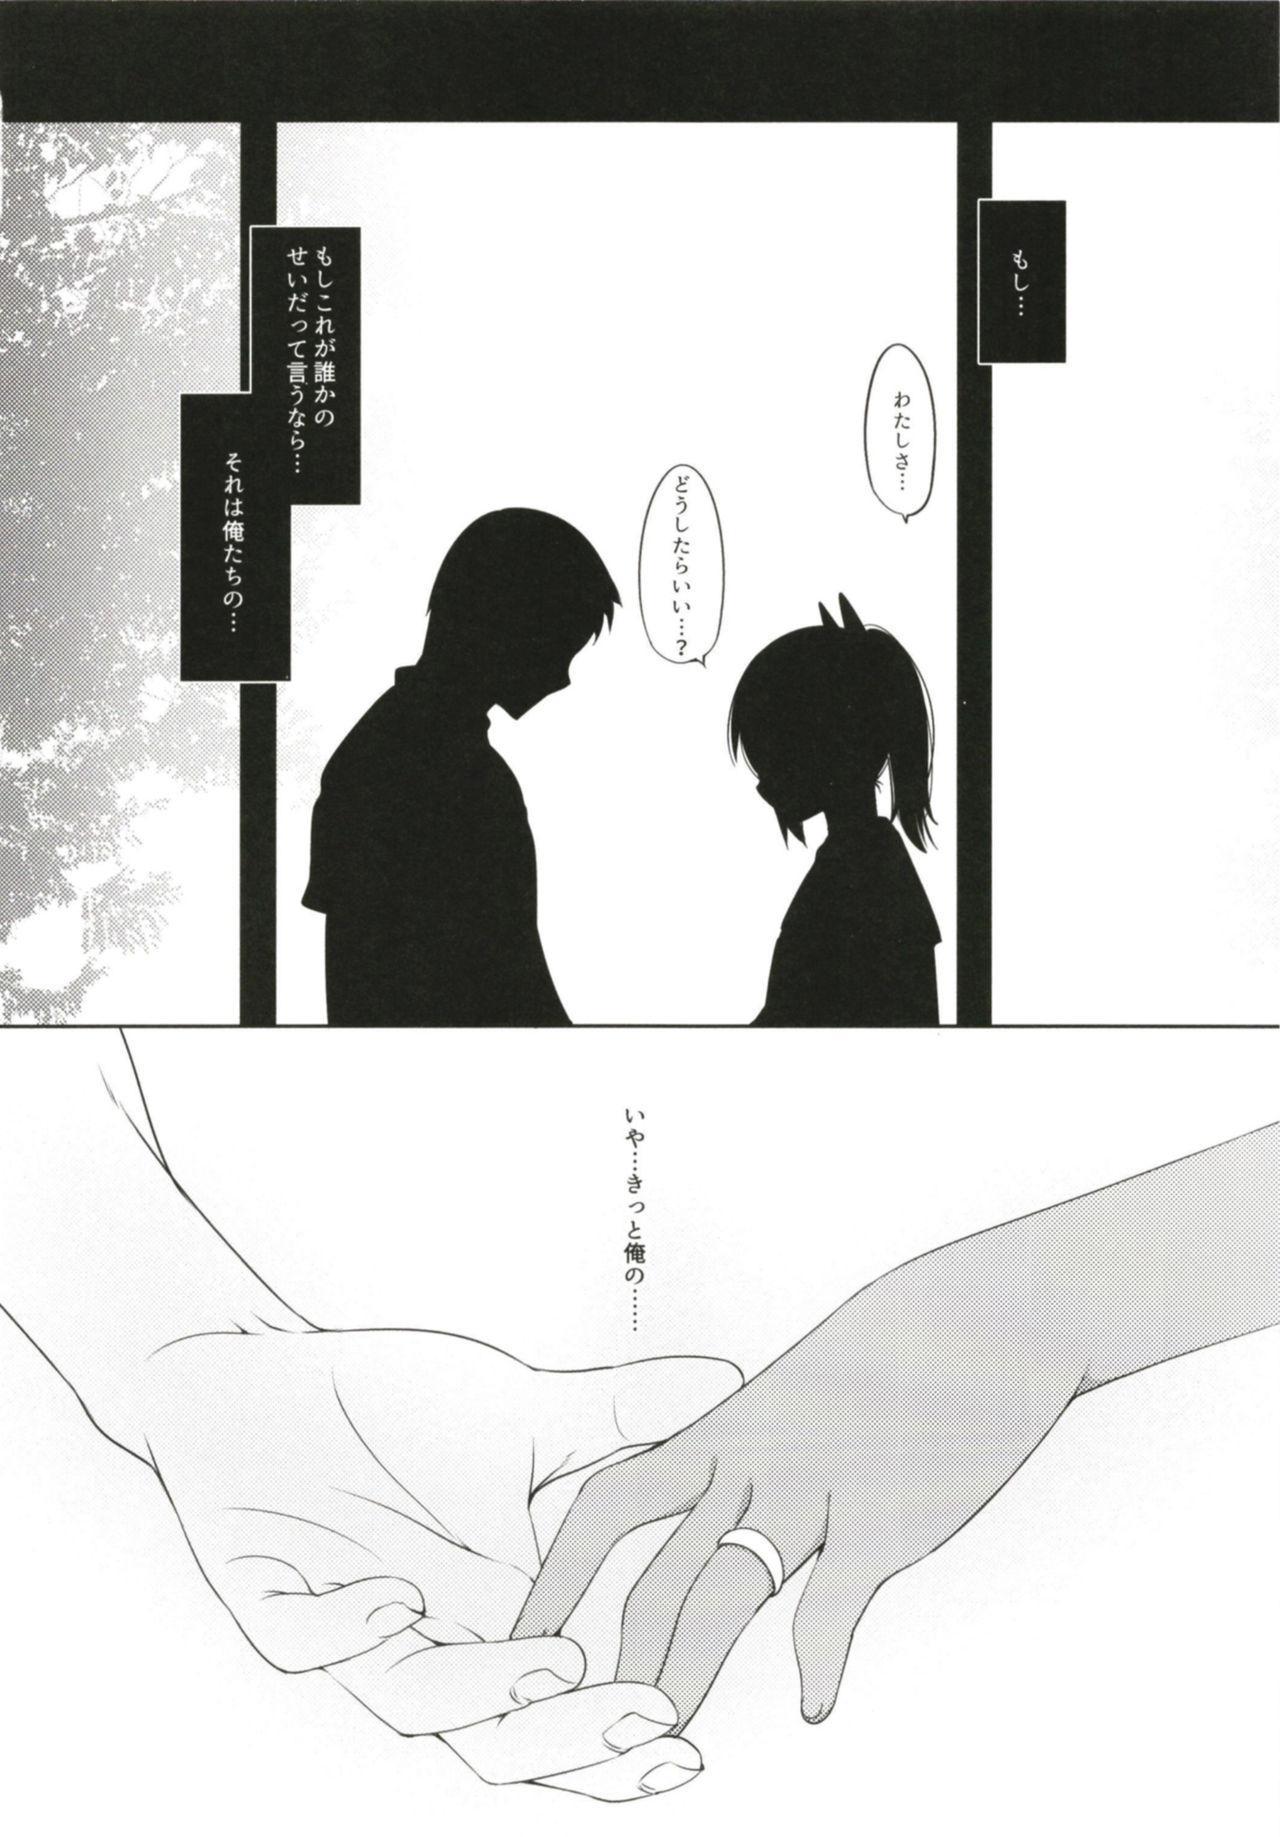 [French letter (Fujisaki Hikari)] Hitonatsu no Ayamachi -I-401 Soushuuhen- (Kantai Collection -KanColle-) [Digital] 57